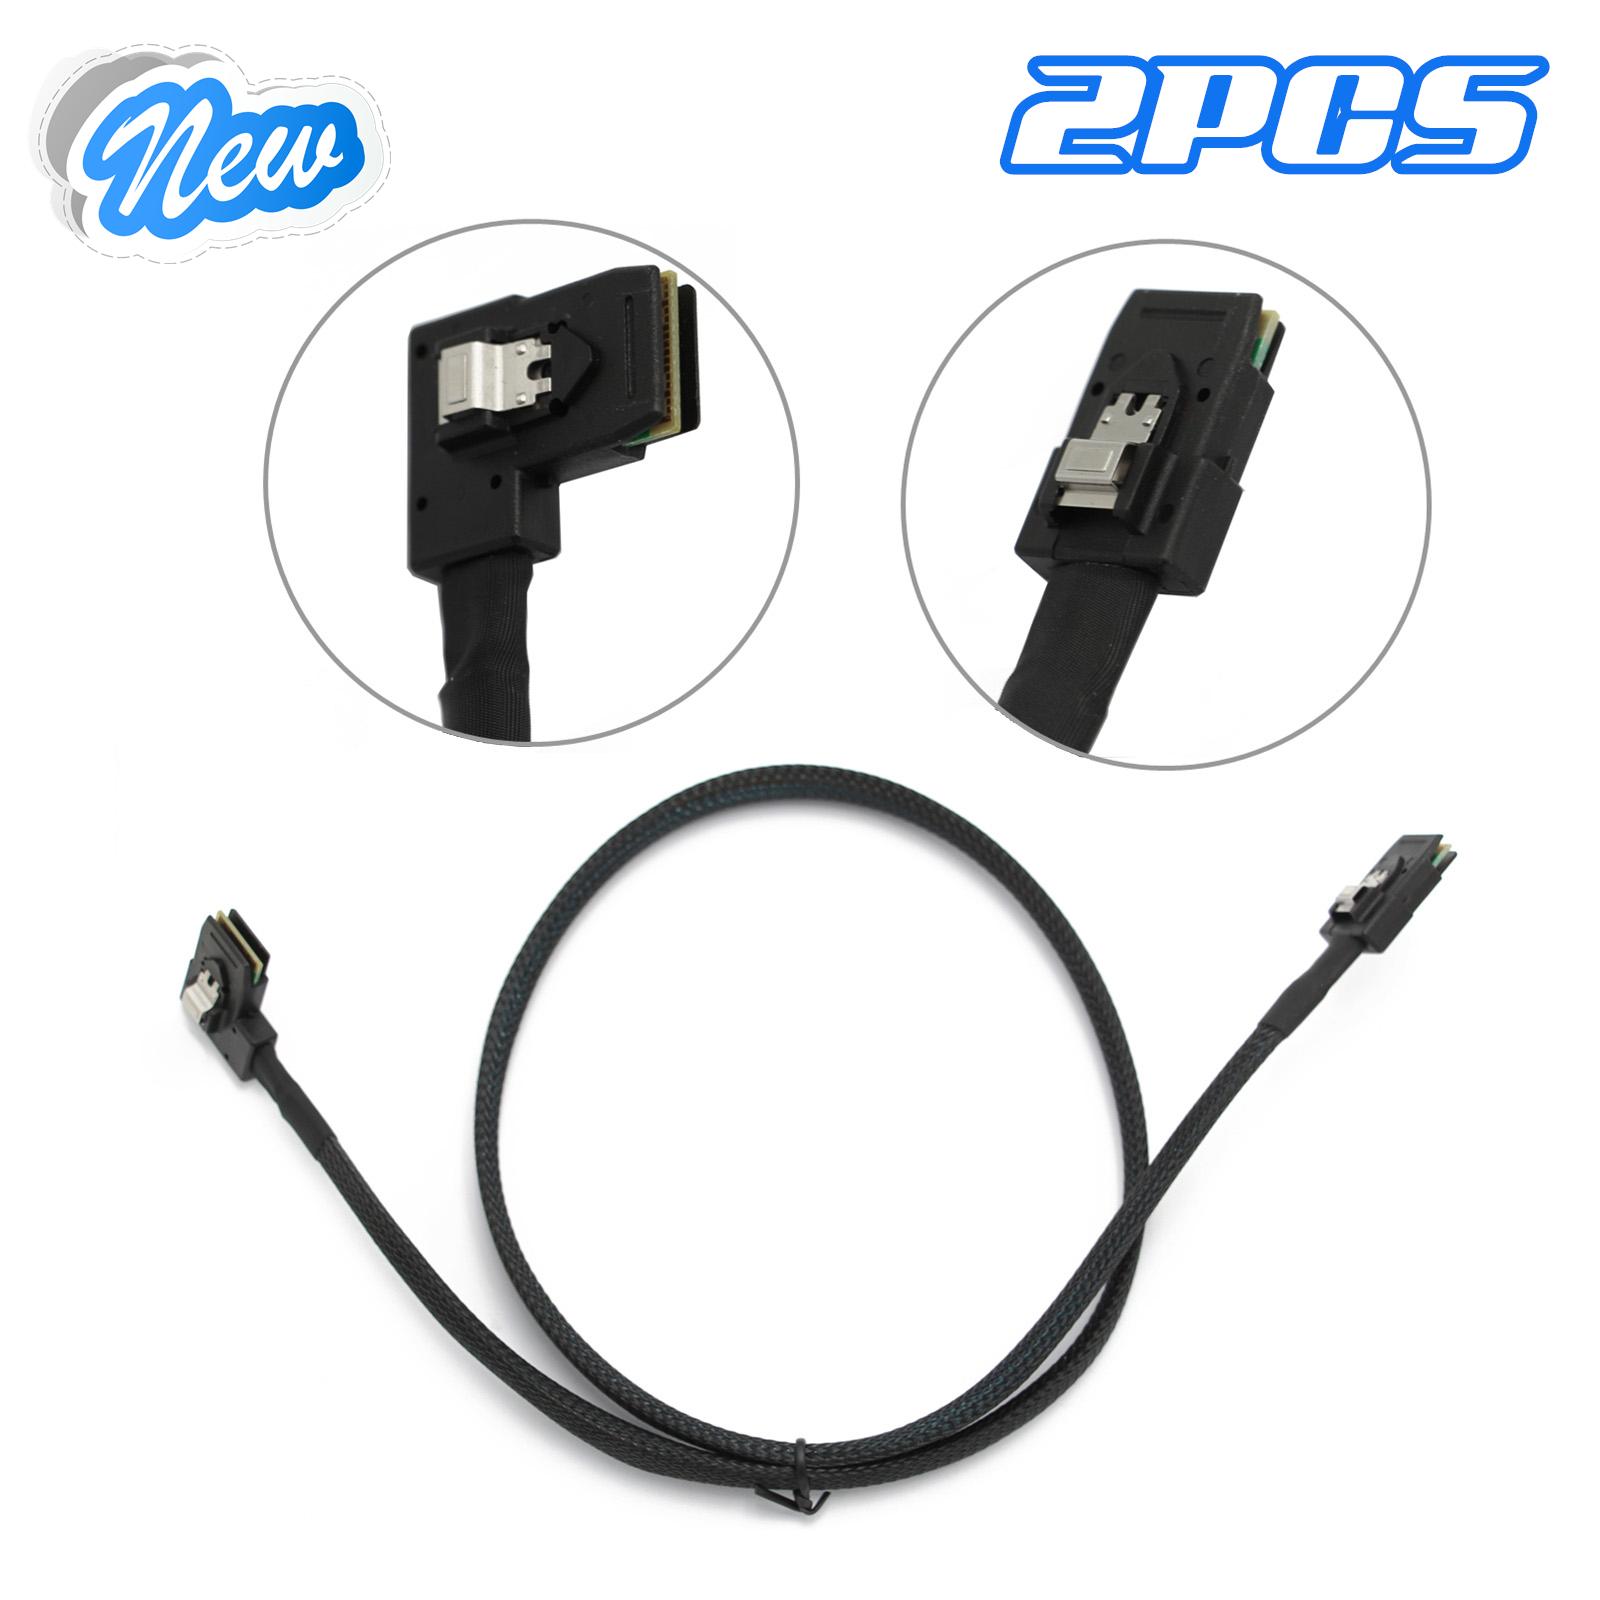 2pcs M246M 0M246M SAS-A SAS-B SATA Cable Raid Controller For Dell R610 R710 H700